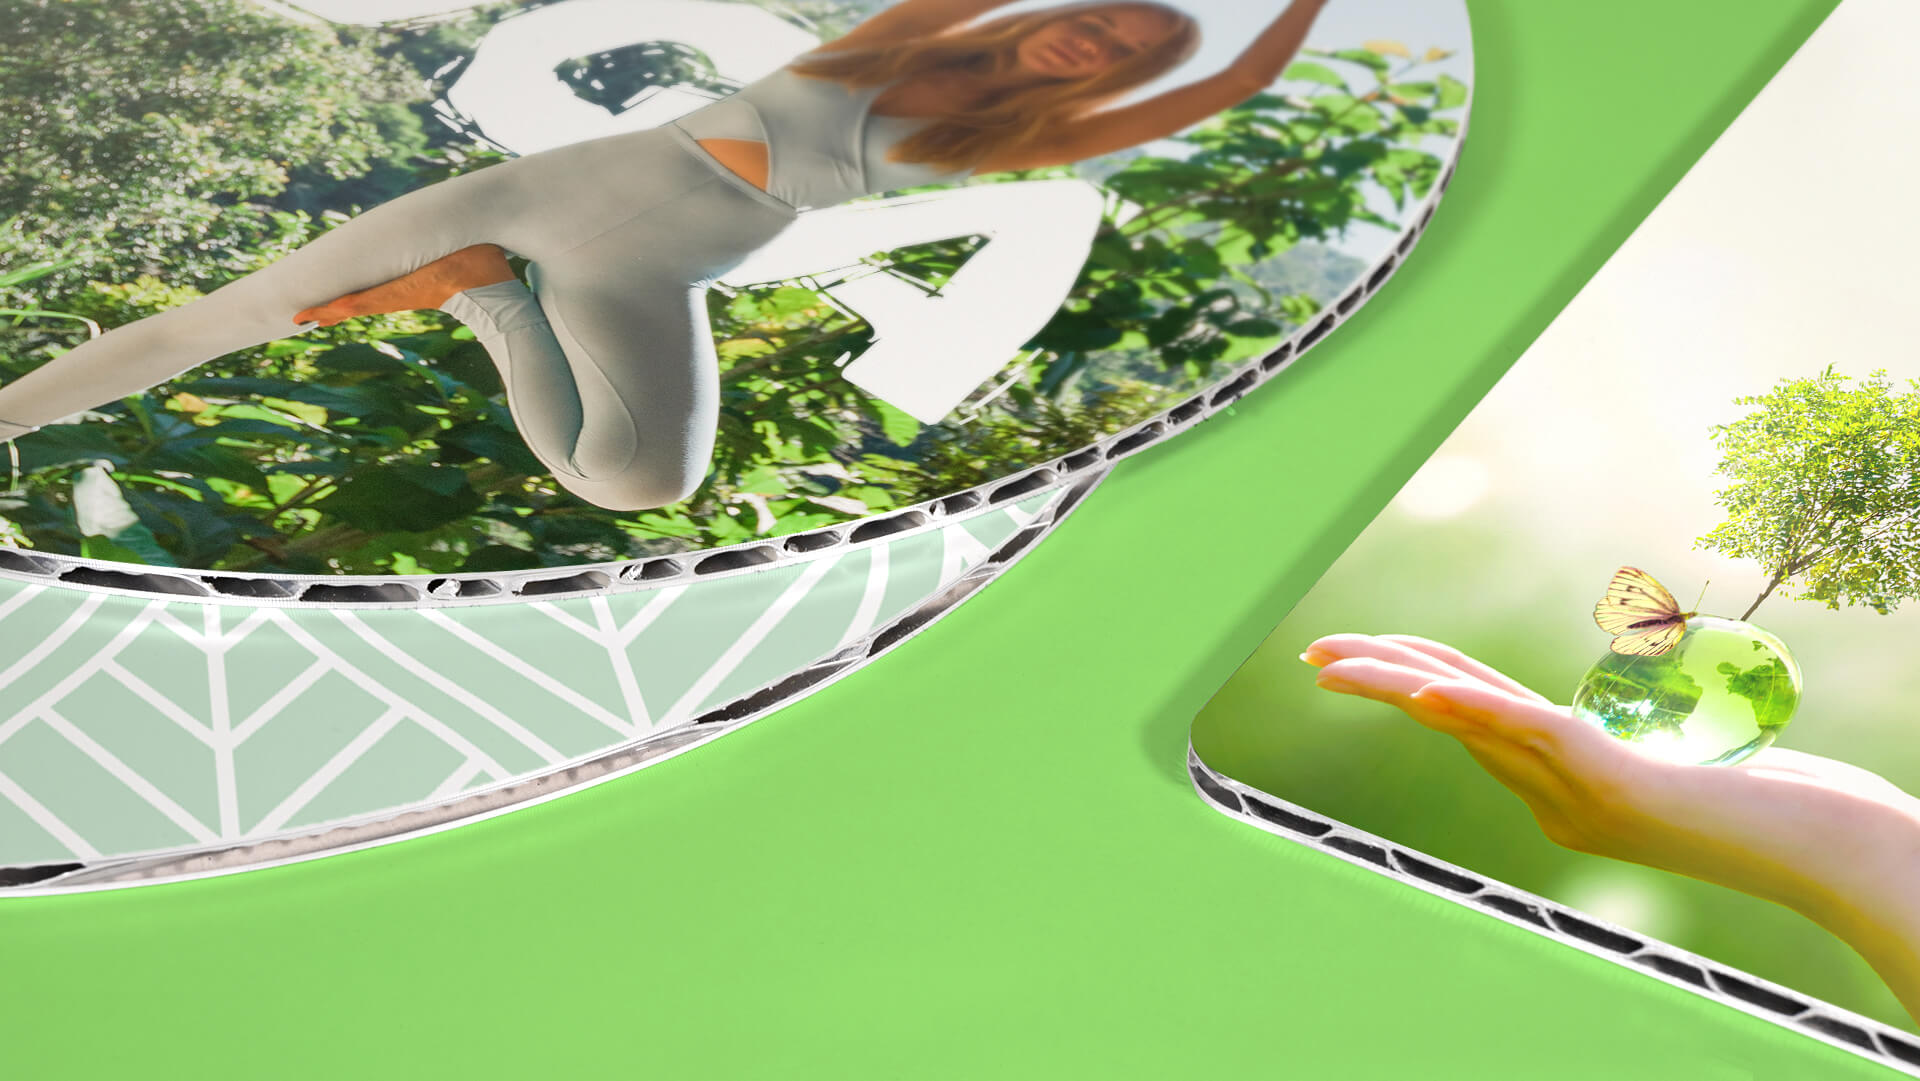 Dettaglio stampa su pannello Smartbond® 3,5 mm | tictac.it